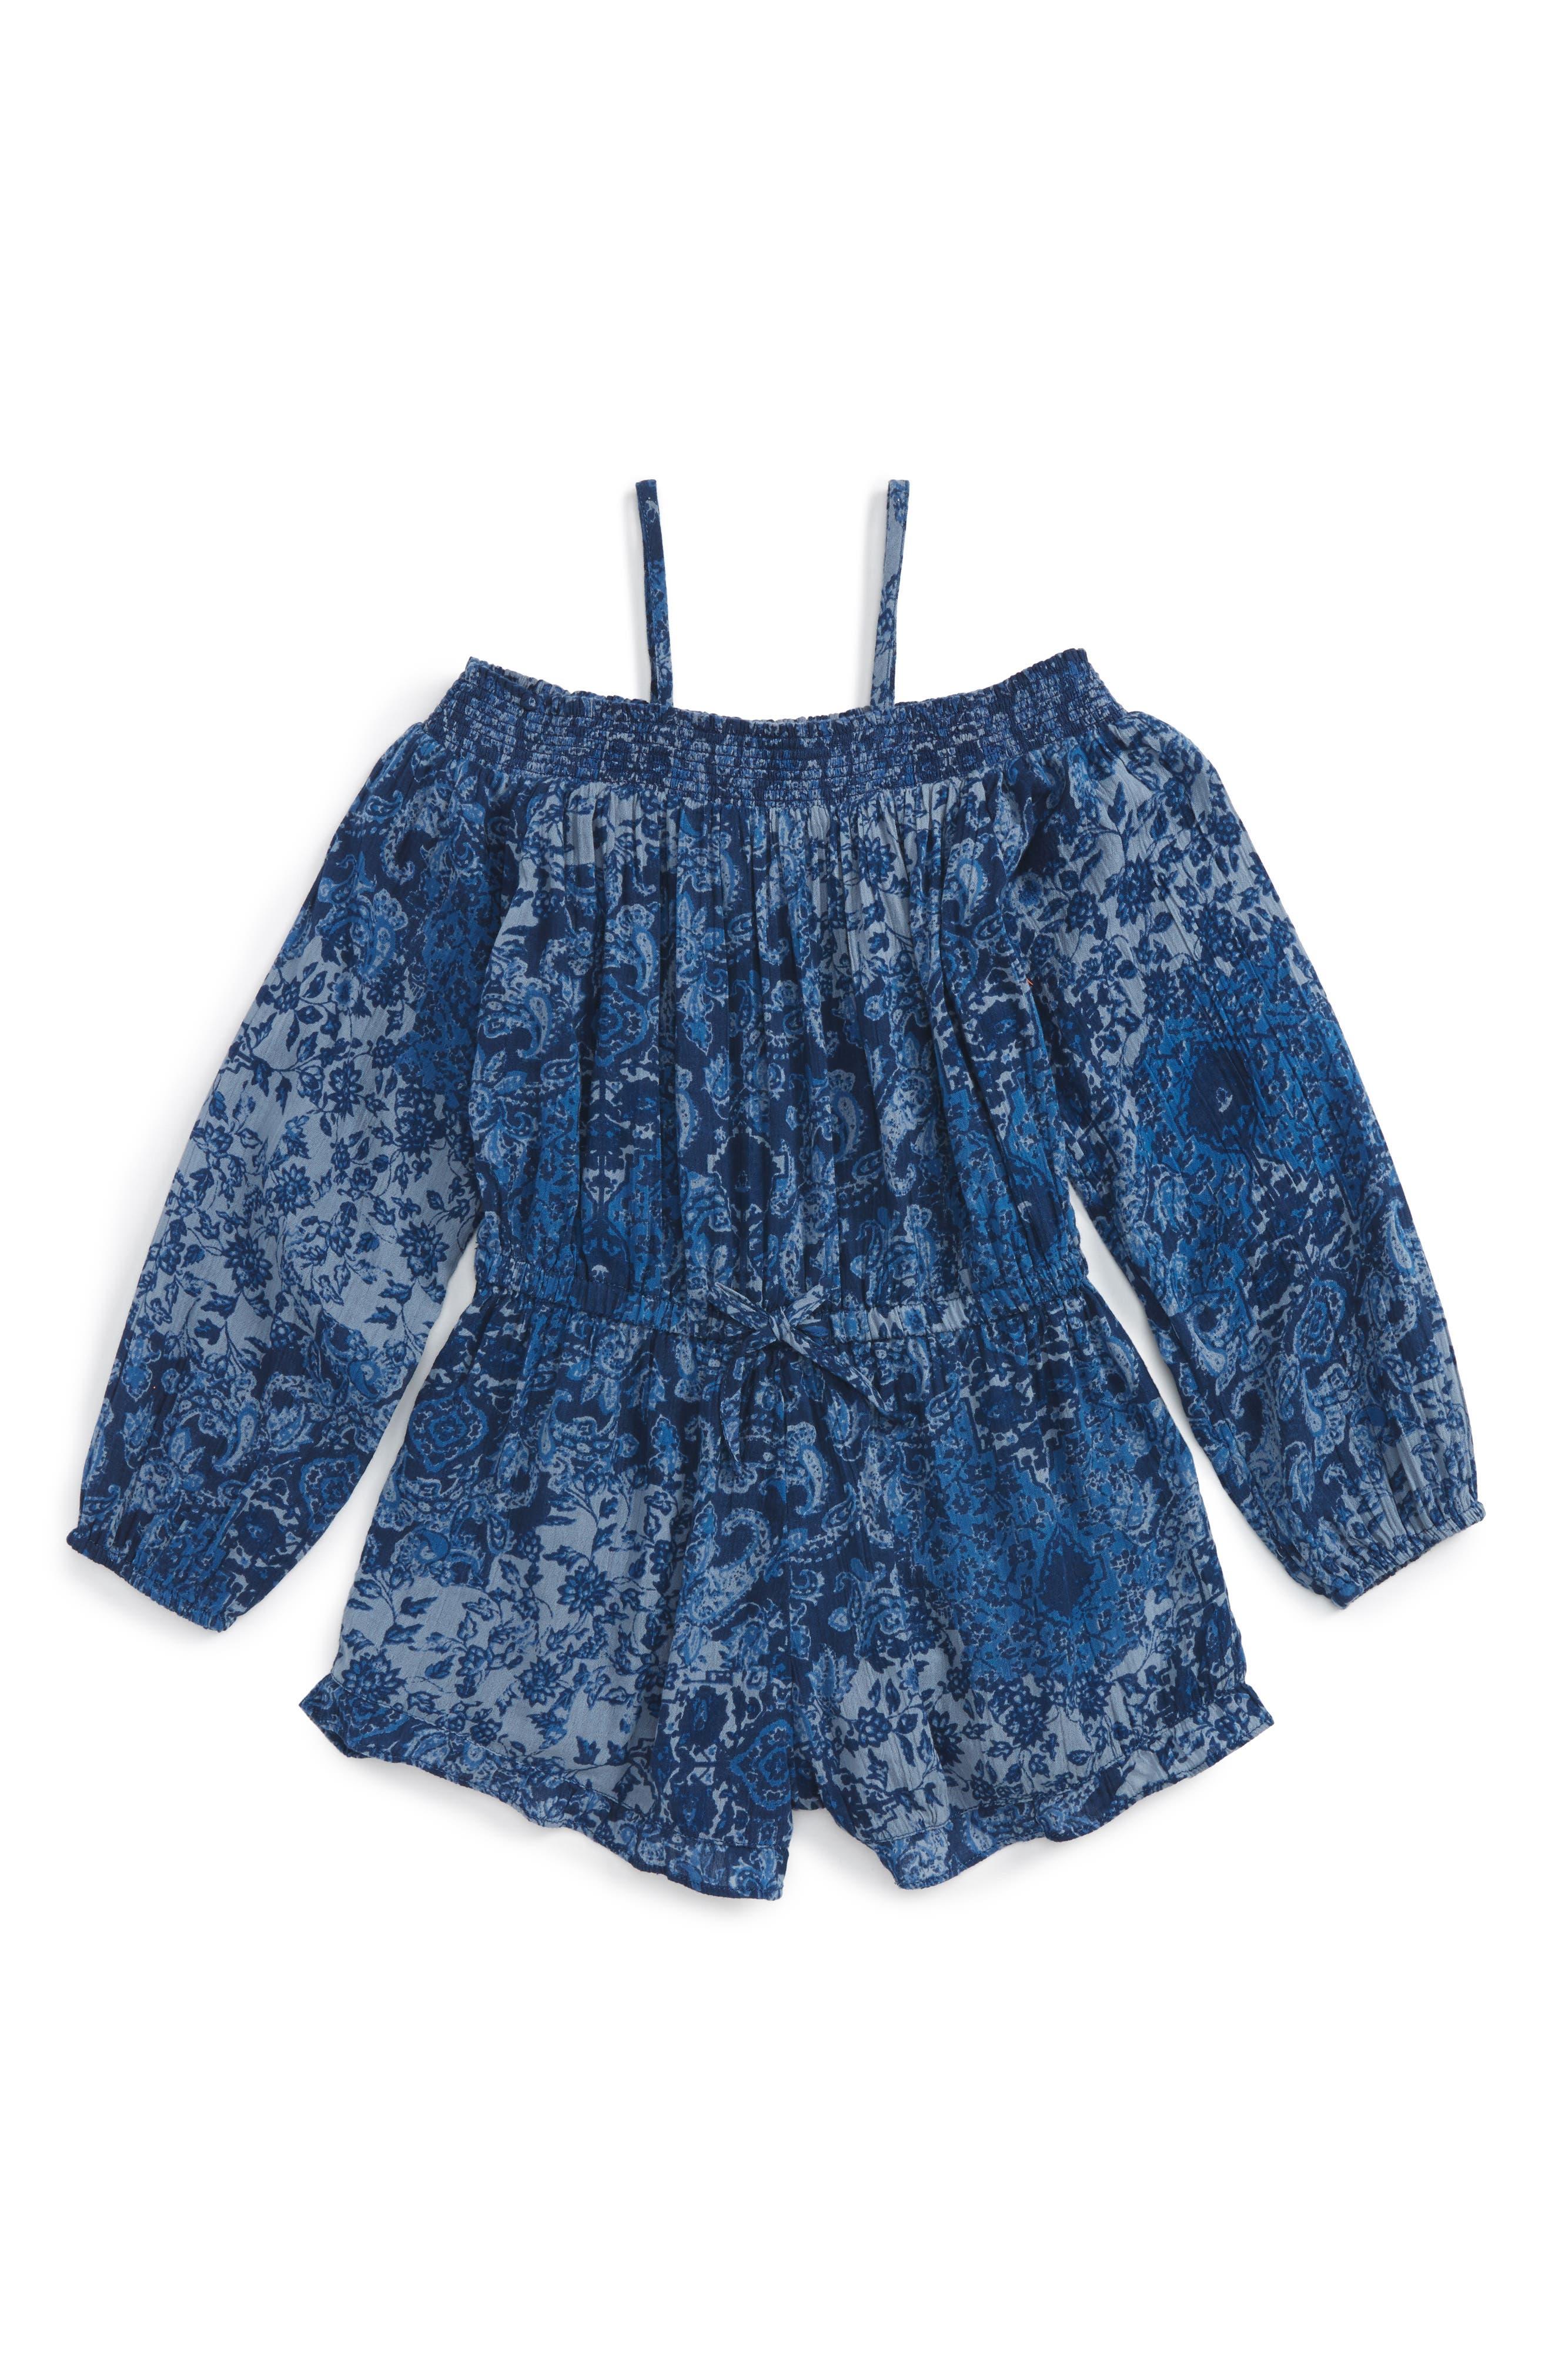 Smocked Romper,                         Main,                         color, Blue Stonewash Patchwork